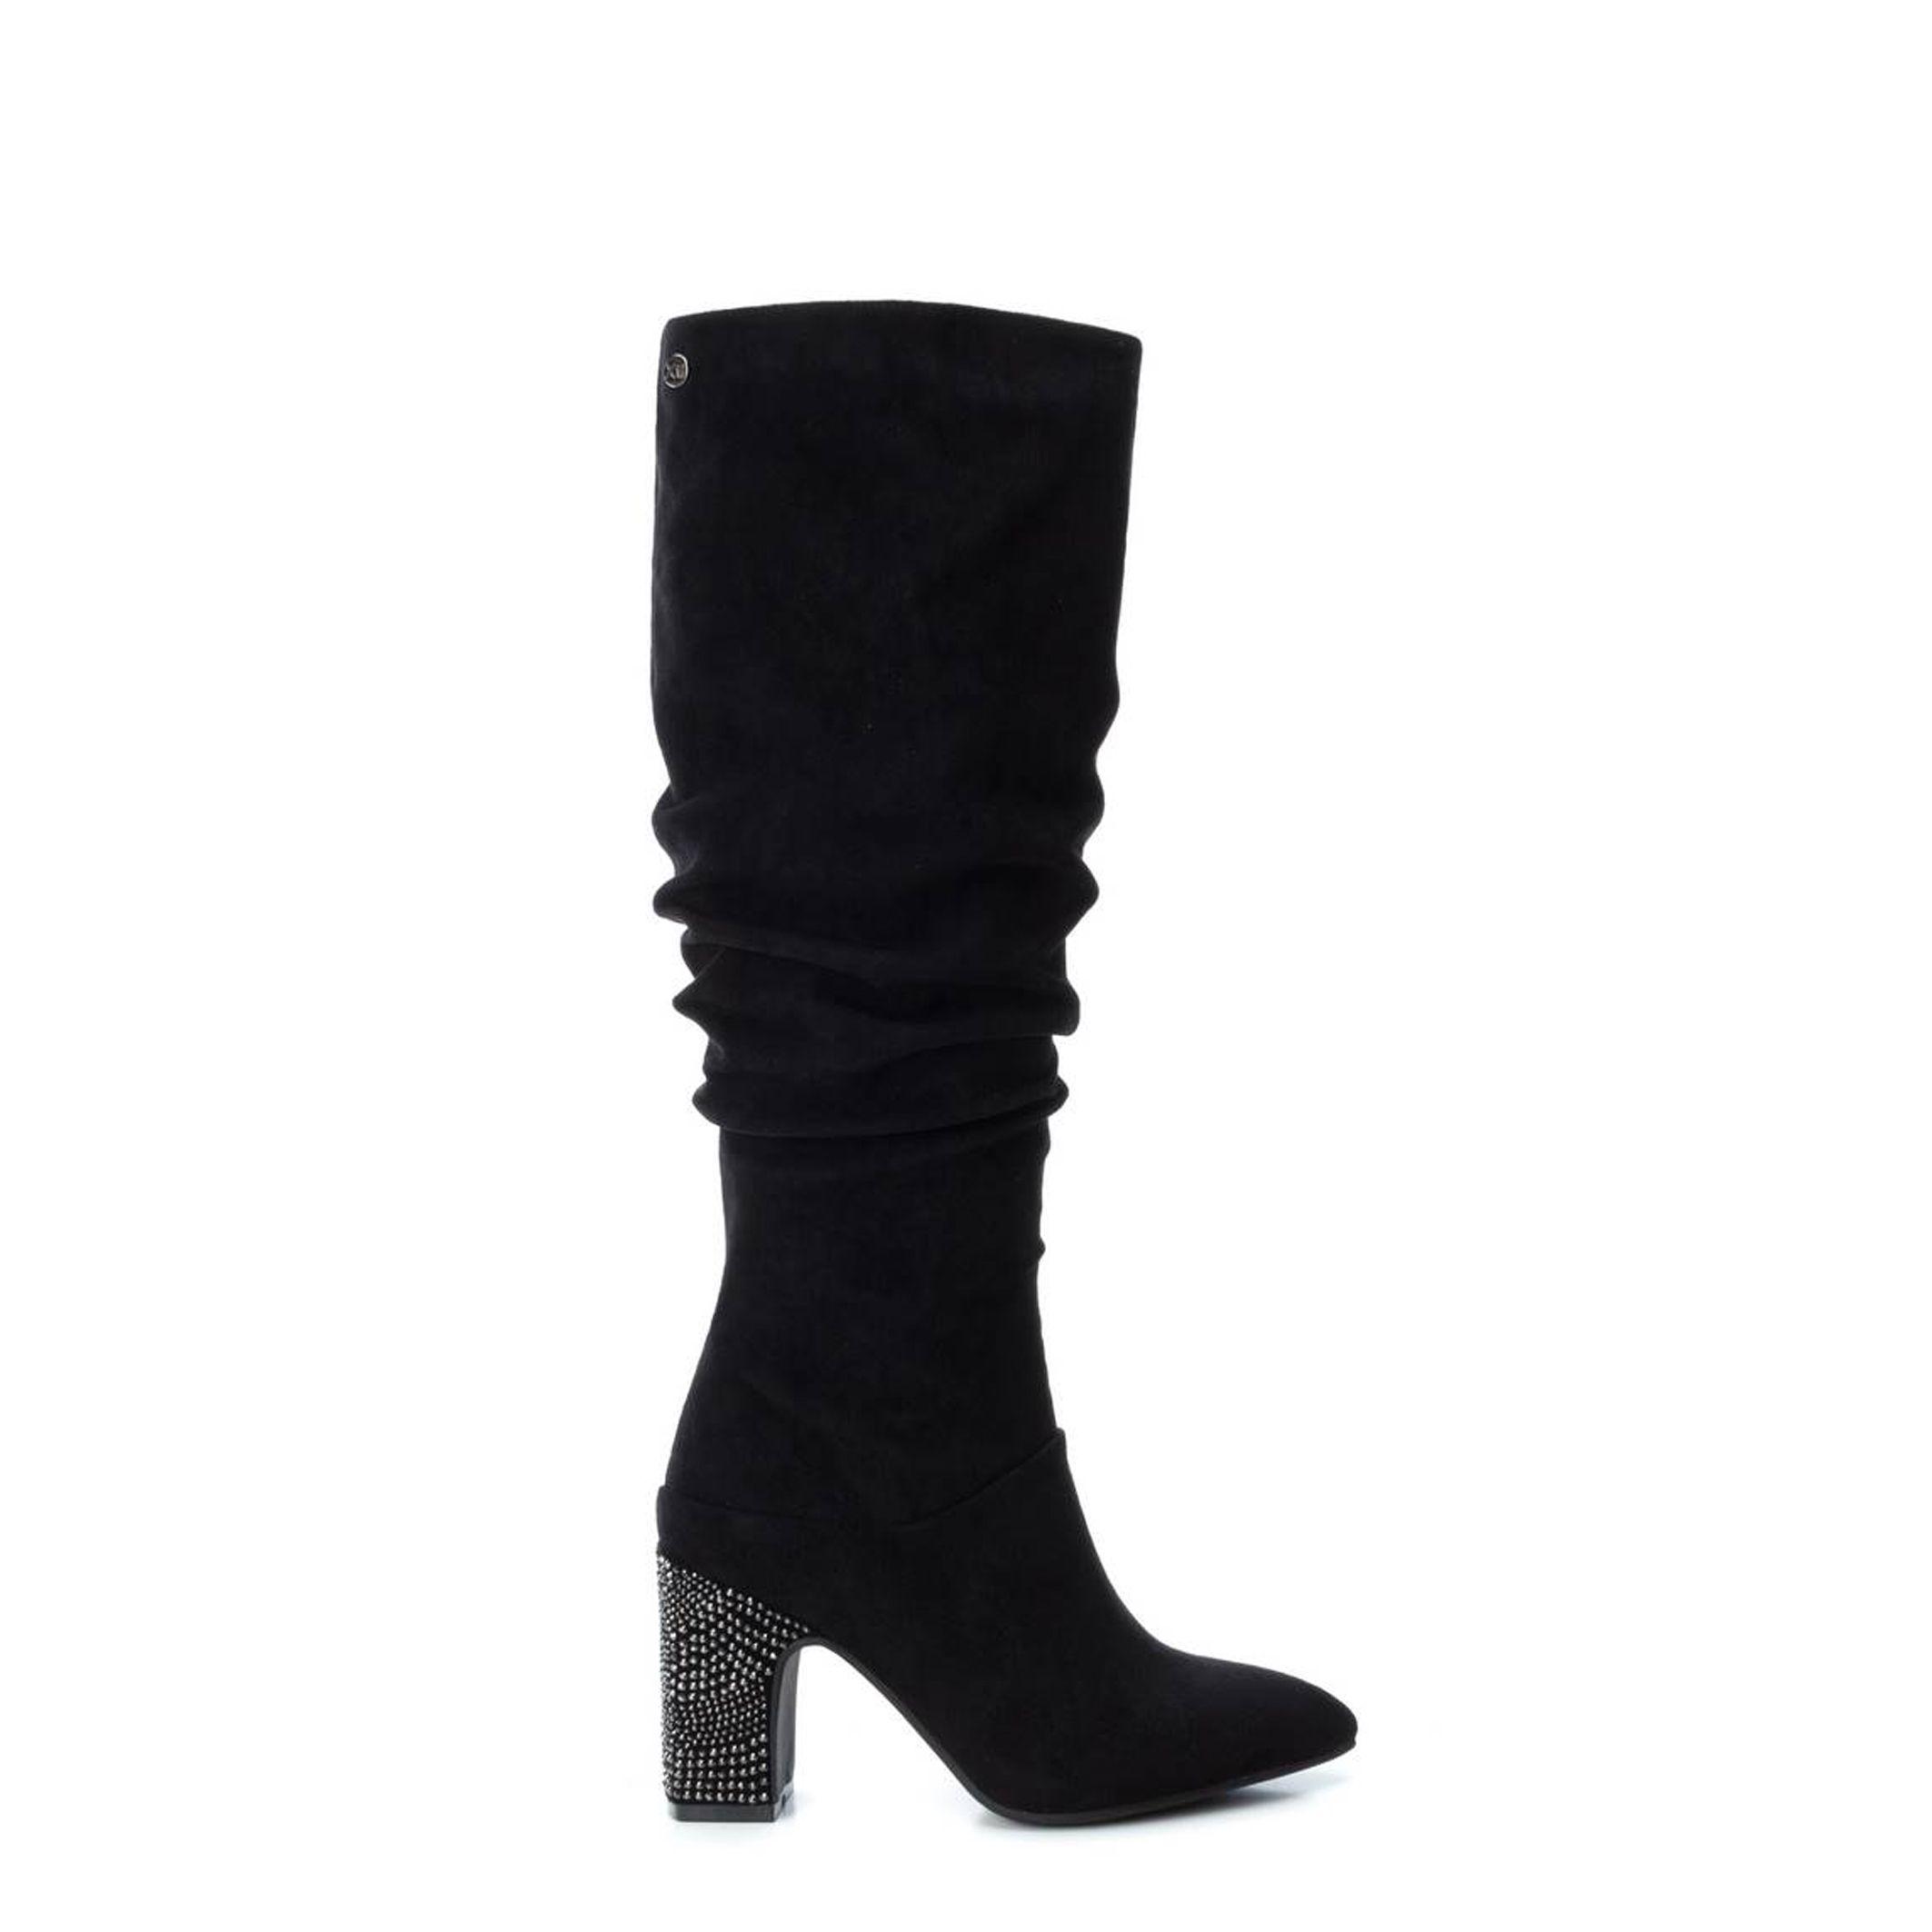 Schuhe Xti – 35087 – Schwarz